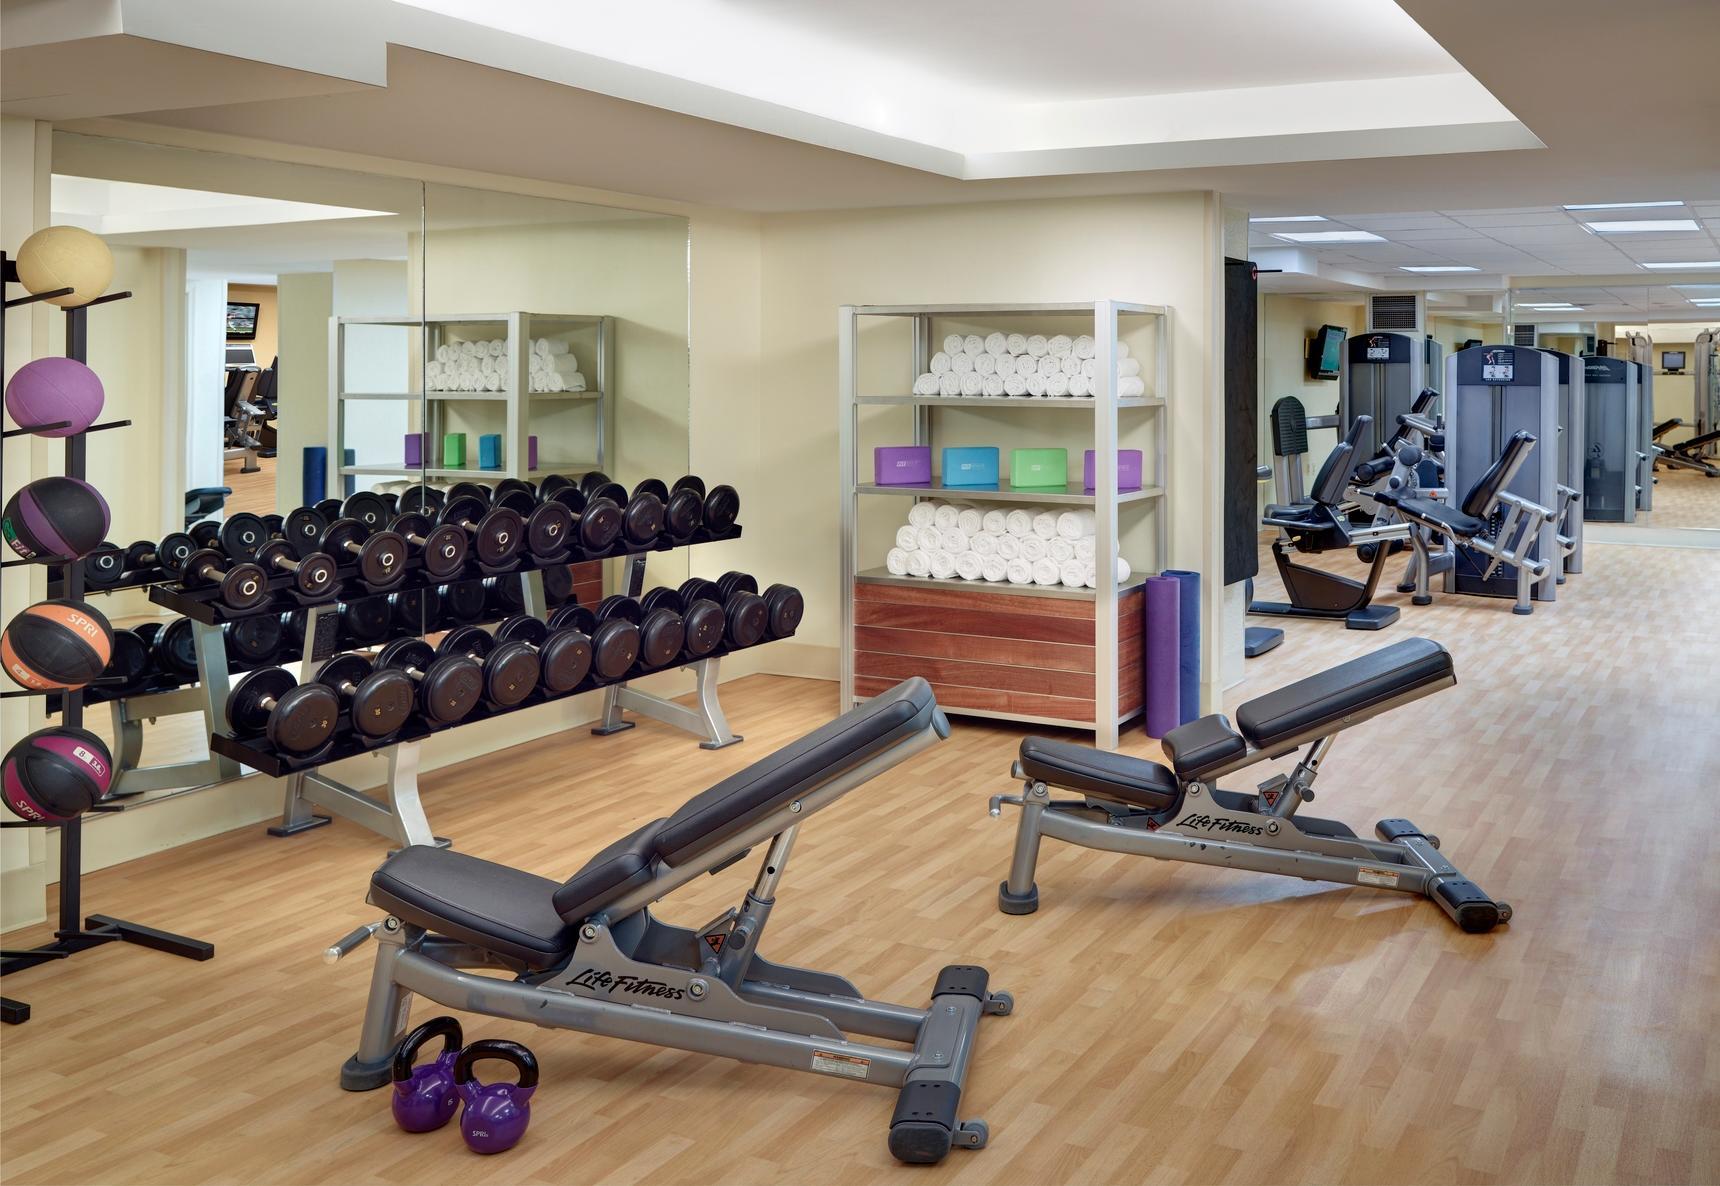 Tysons Corner Marriott image 1